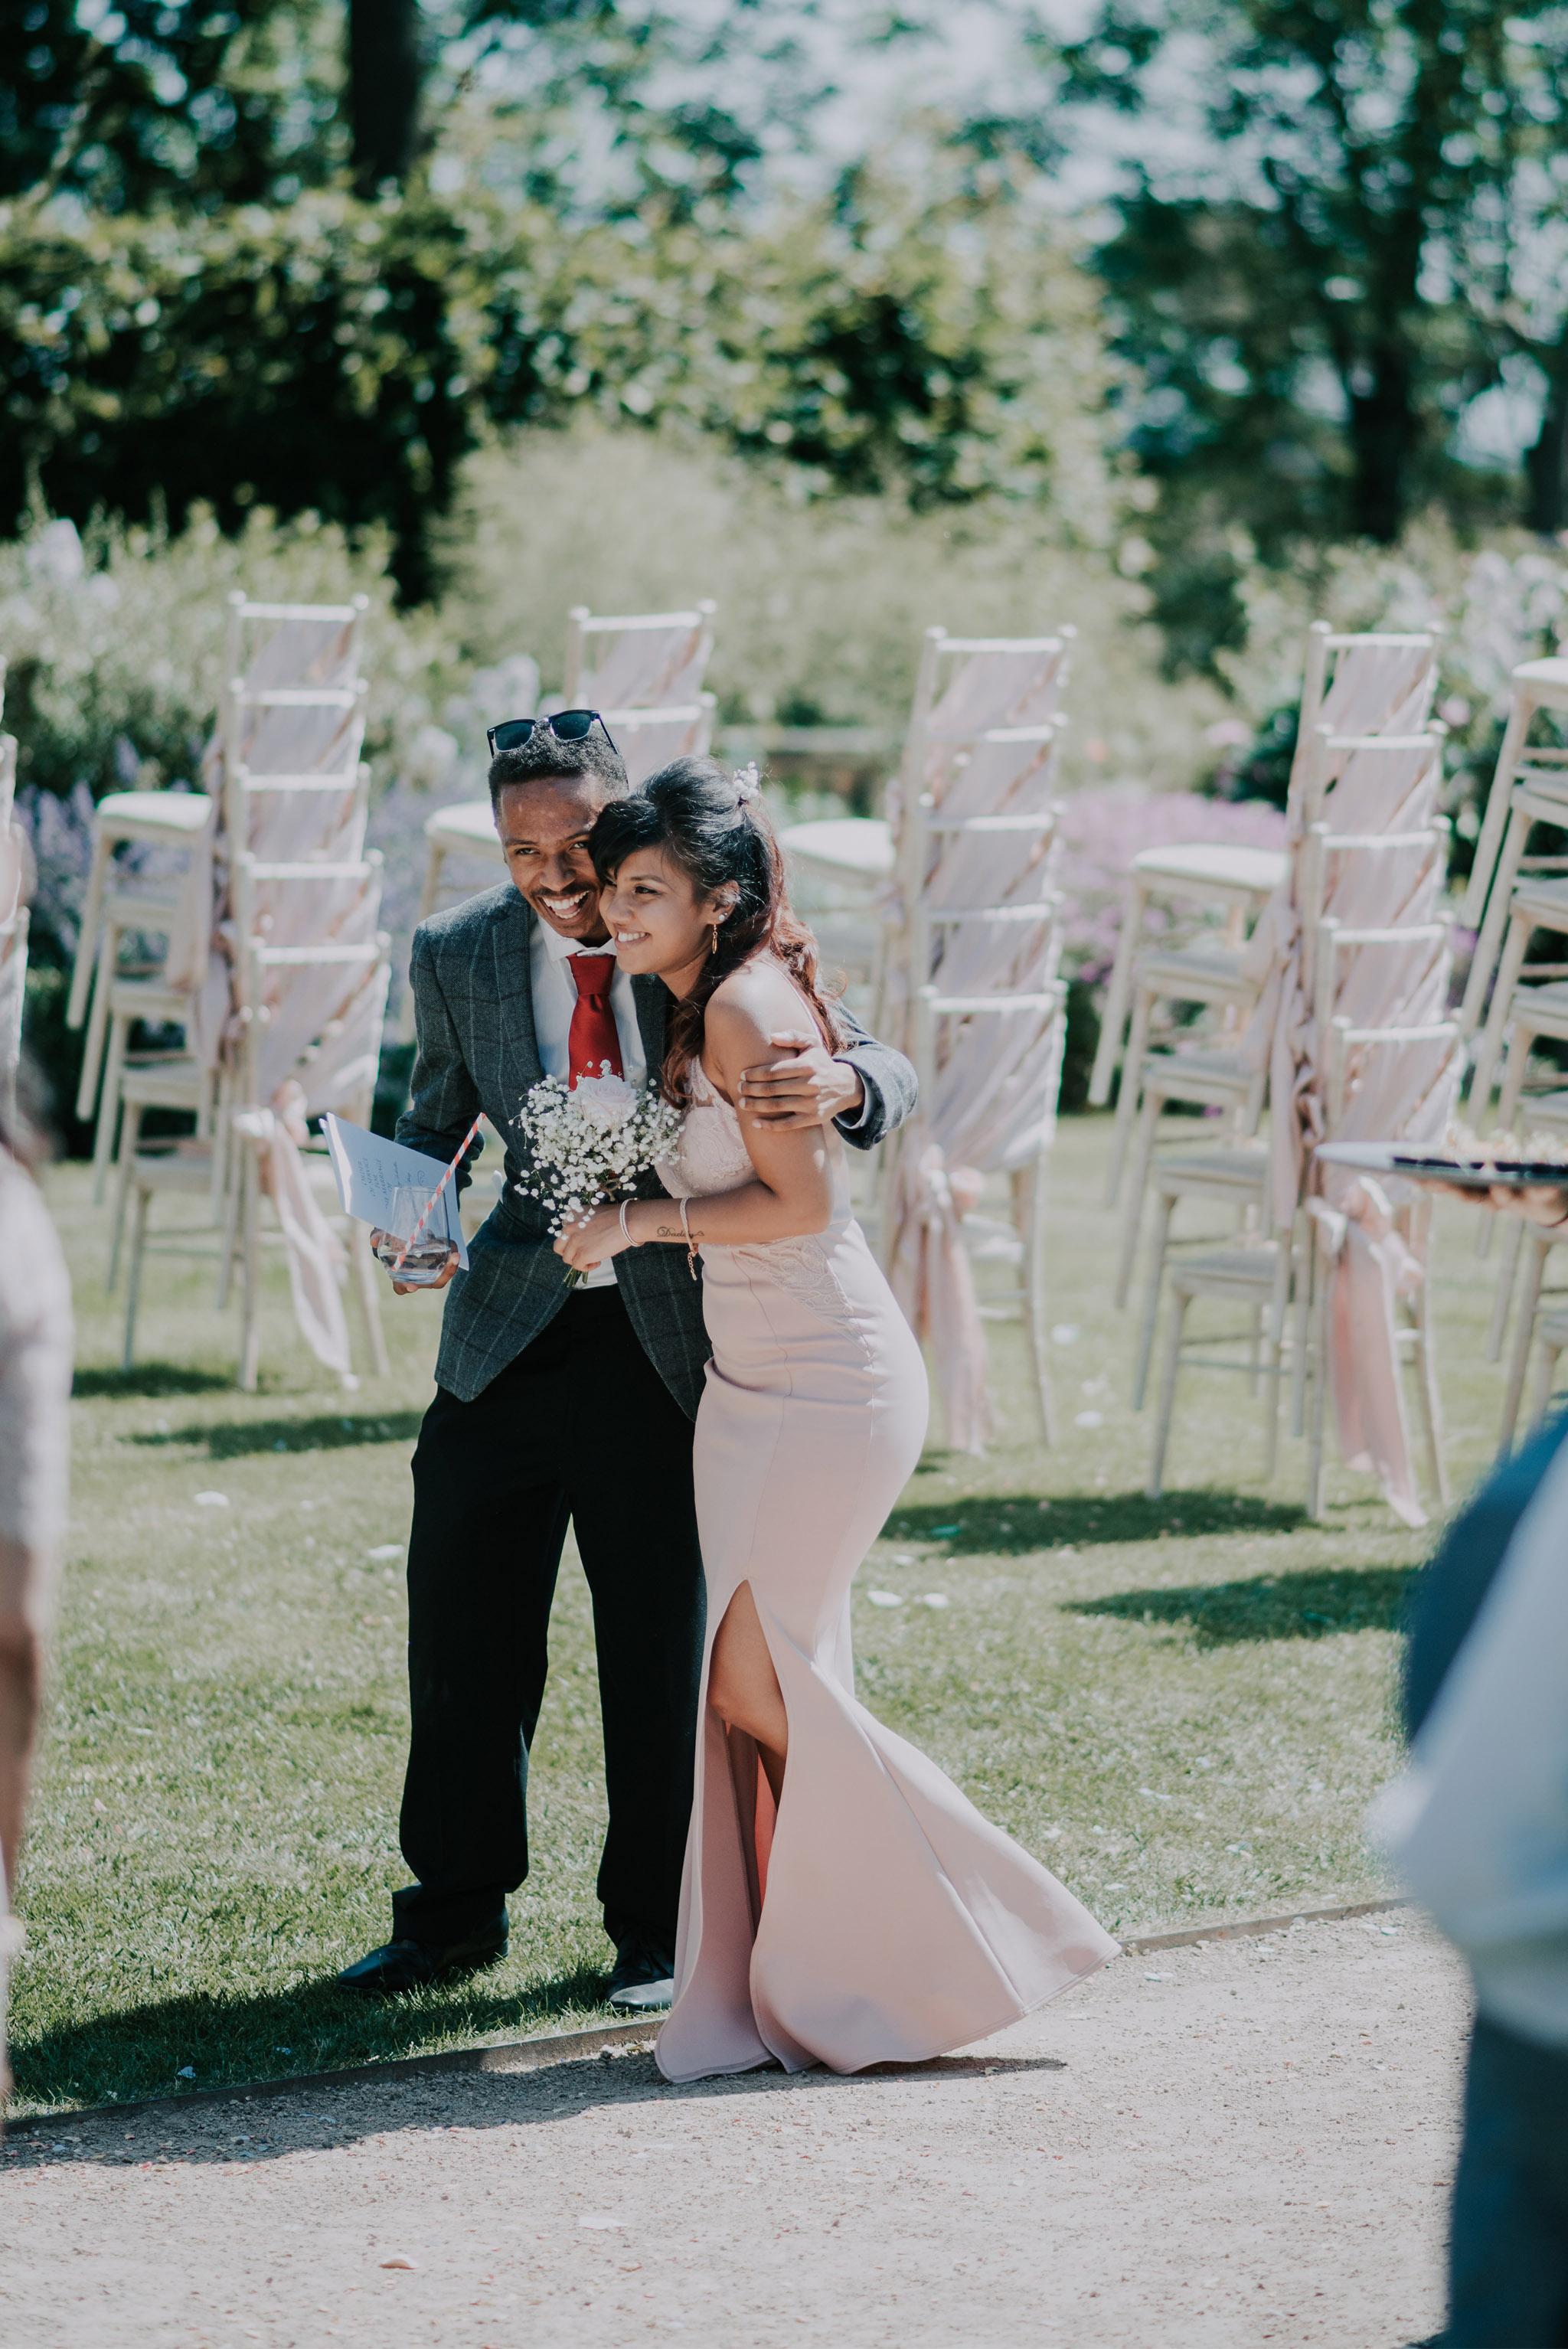 scott-stockwell-photography-wedding-10.jpg